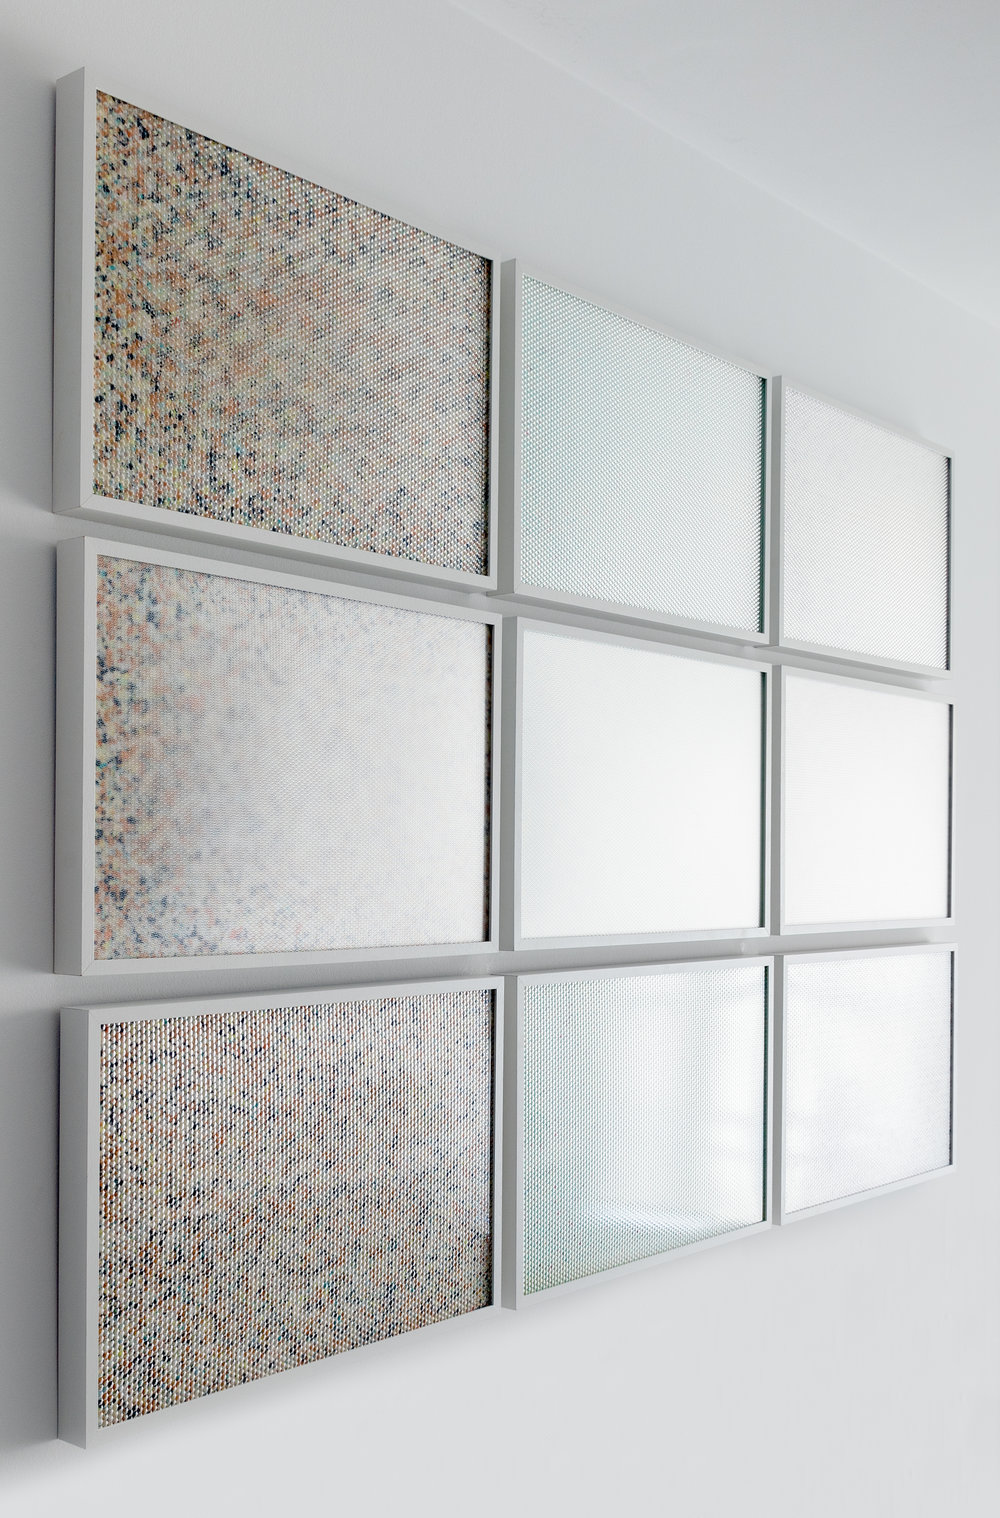 Molecular - Side View (2016) 9 panel grid, painted insulation foam beneath structured Plexiglas. 190 x 130 cm (75 x 51 in.)